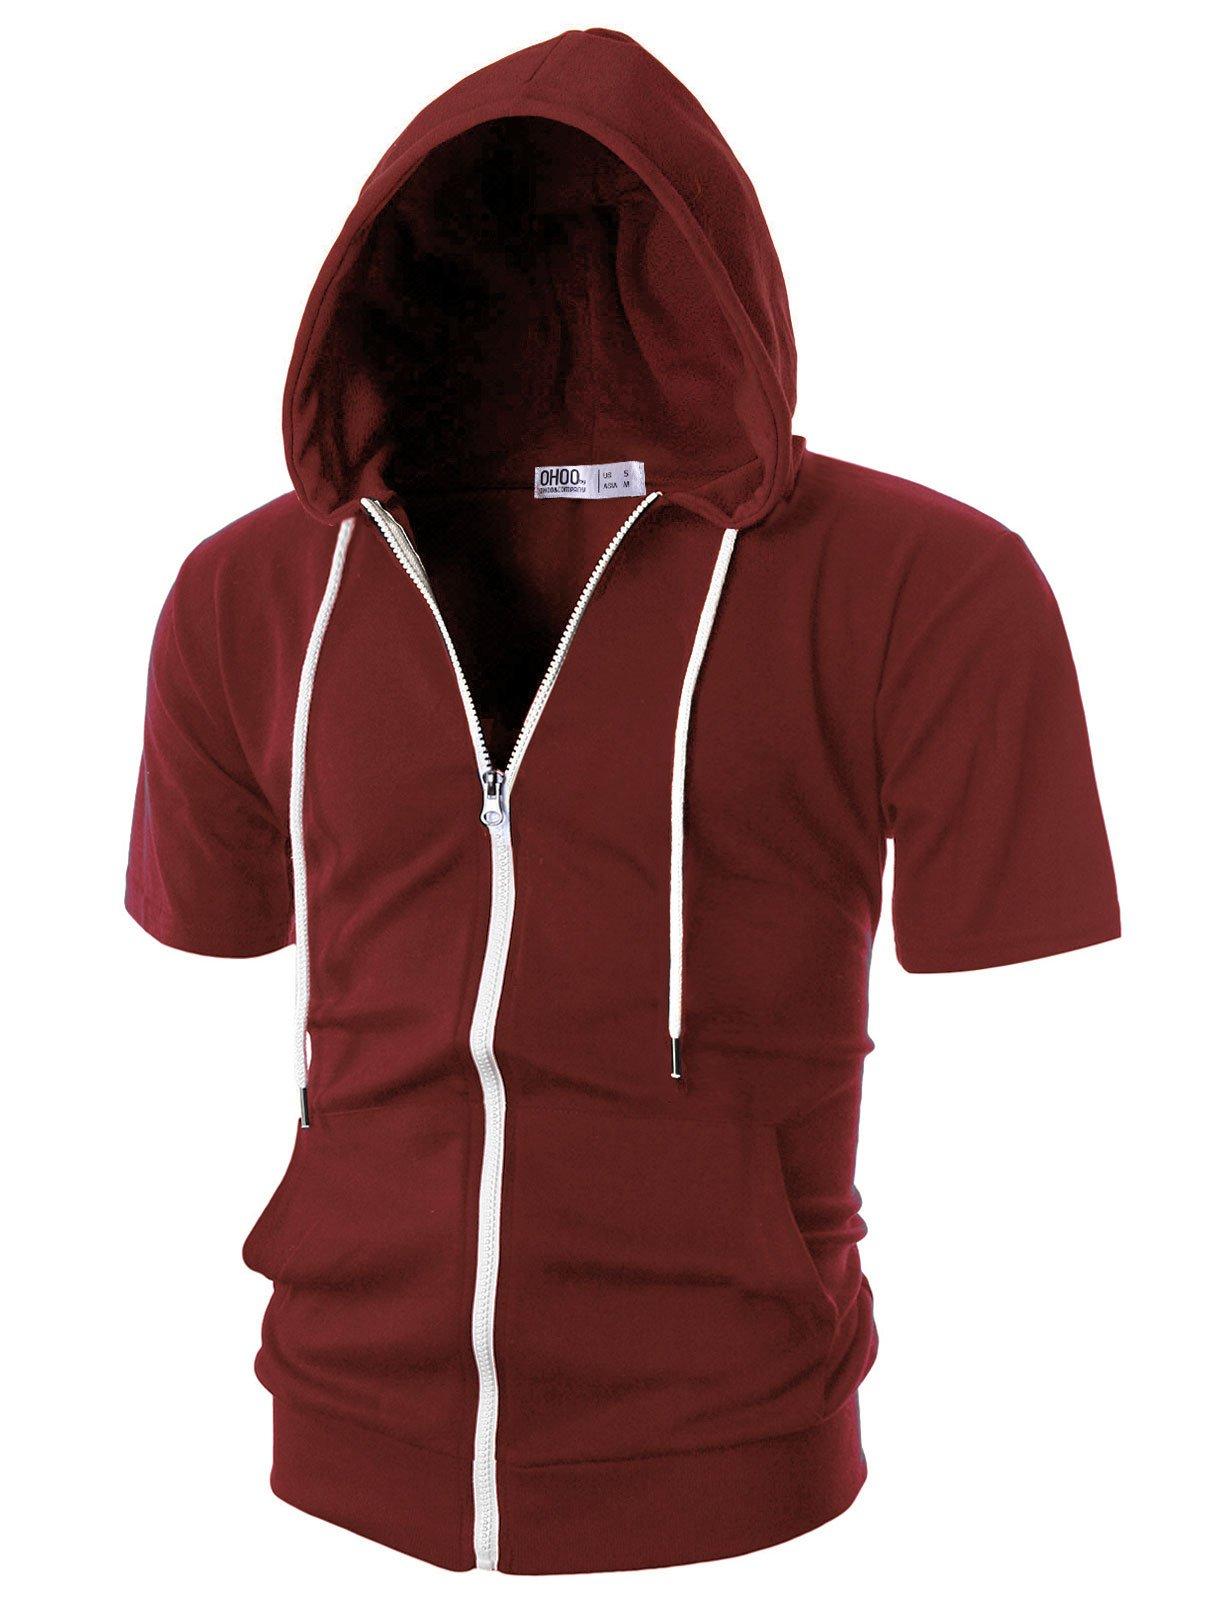 Ohoo Mens Slim Fit Short Sleeve Lightweight Zip-up Hoodie with Kanga Pocket/DCF007-BURGUNDY-L